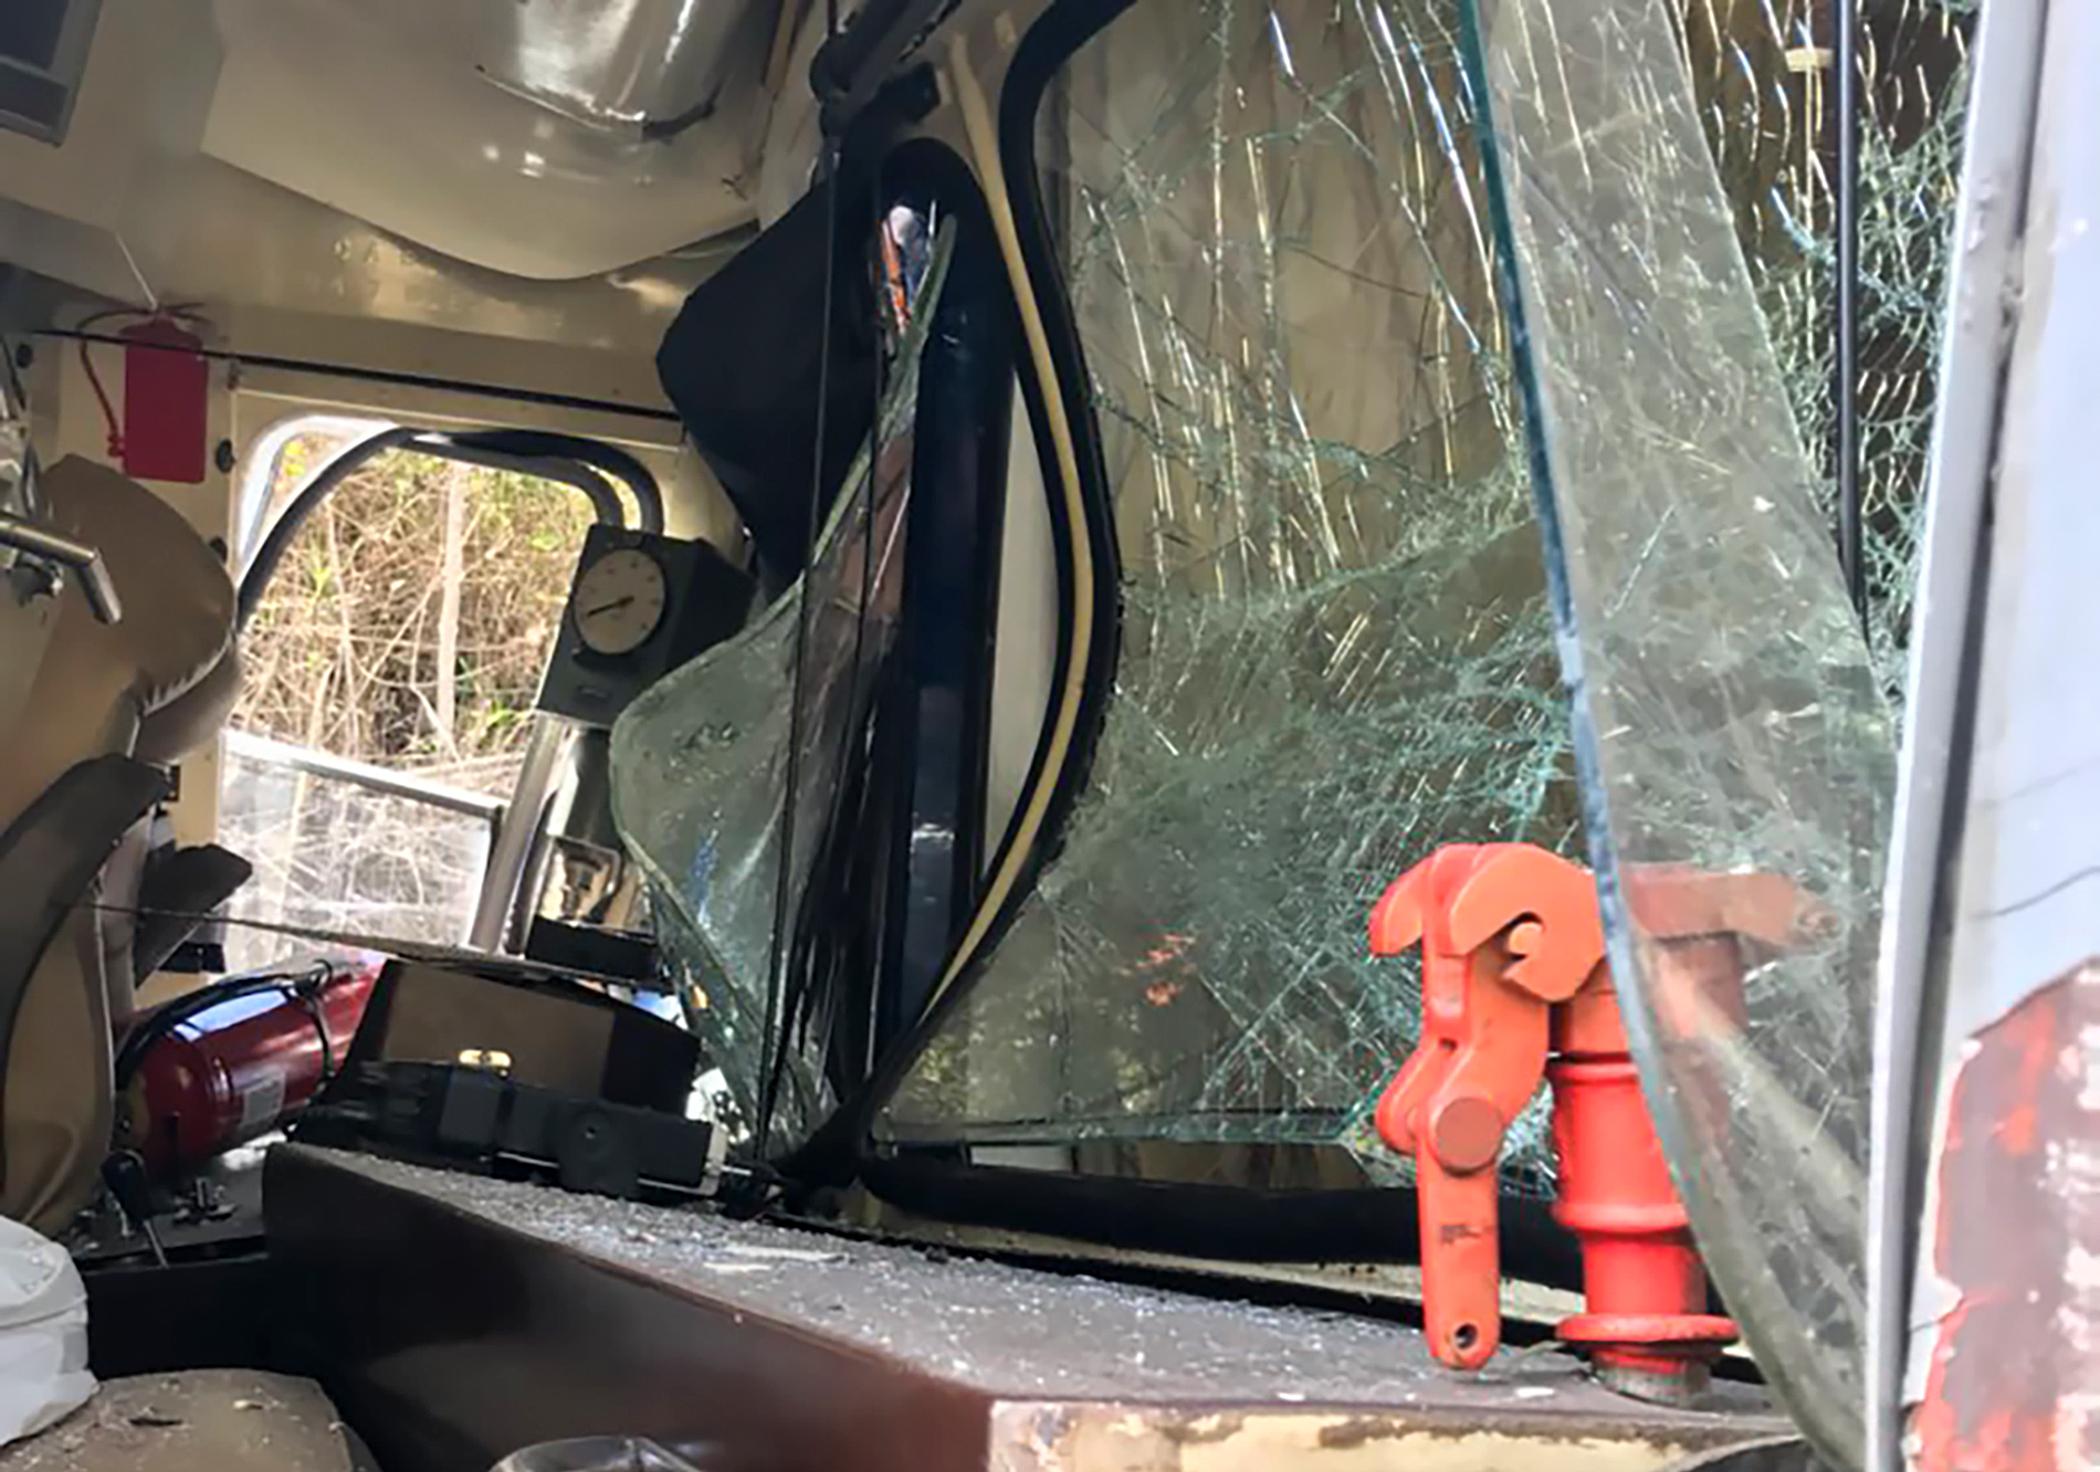 Two tourist trains crashed near the Inca citadel of Machu Picchu, close to Cusco, Peru, on July 31, 2018.